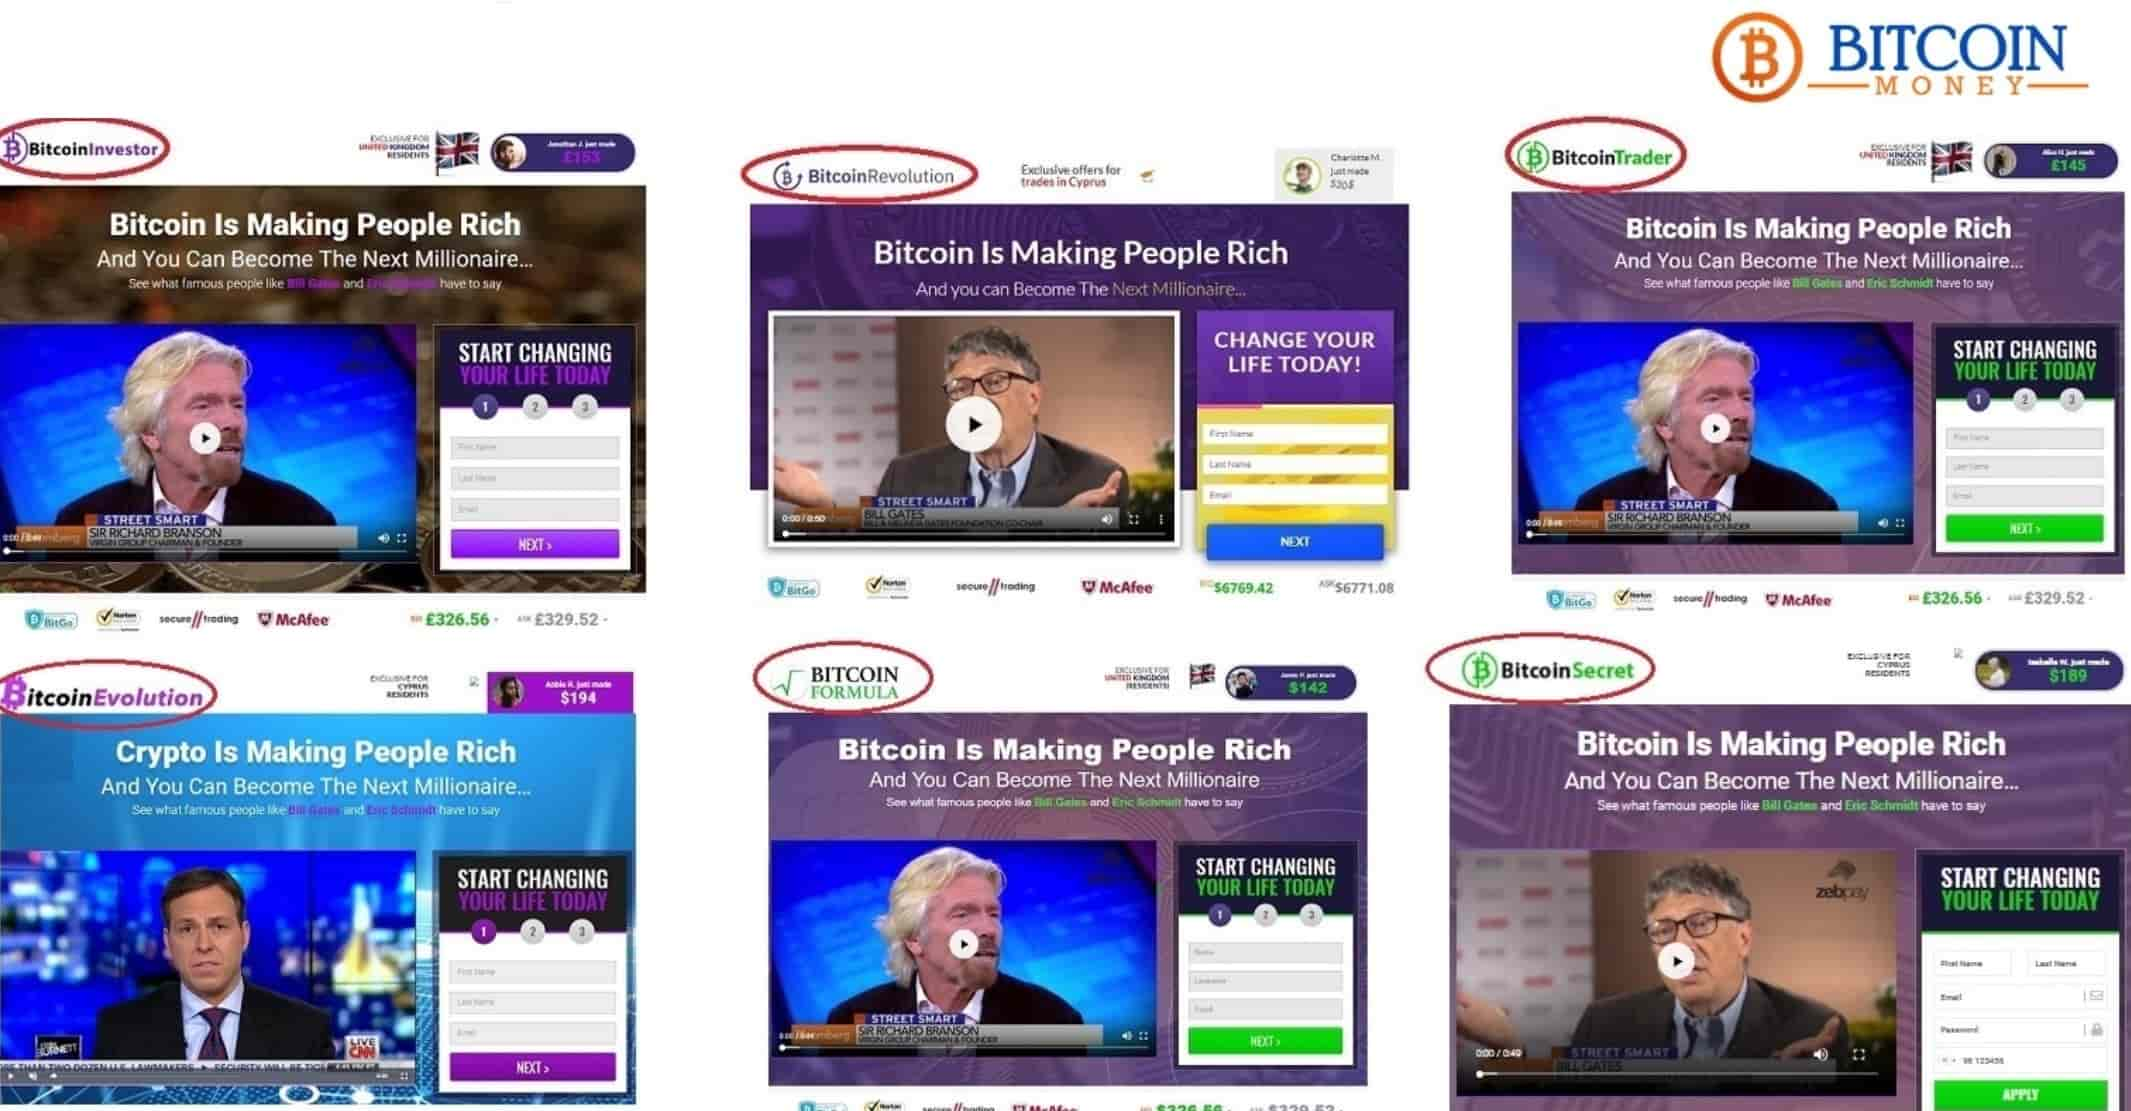 Bitcoin Money exposed